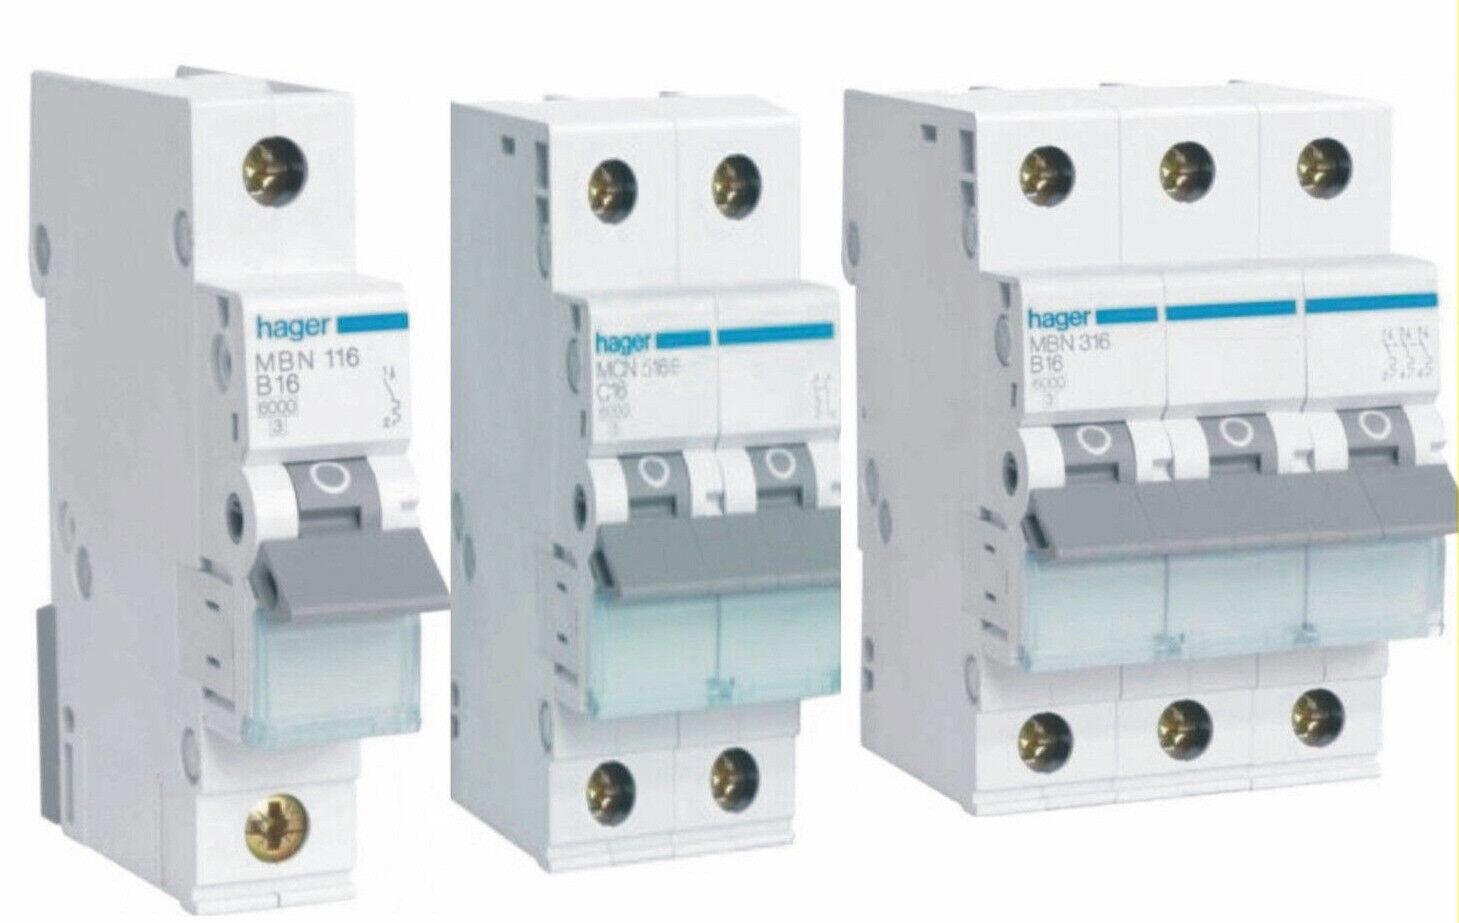 LS-Schalter FI-Schalter Sicherungsautomat Schutzschalter Leitungsschutzschalter | Garantiere Qualität und Quantität